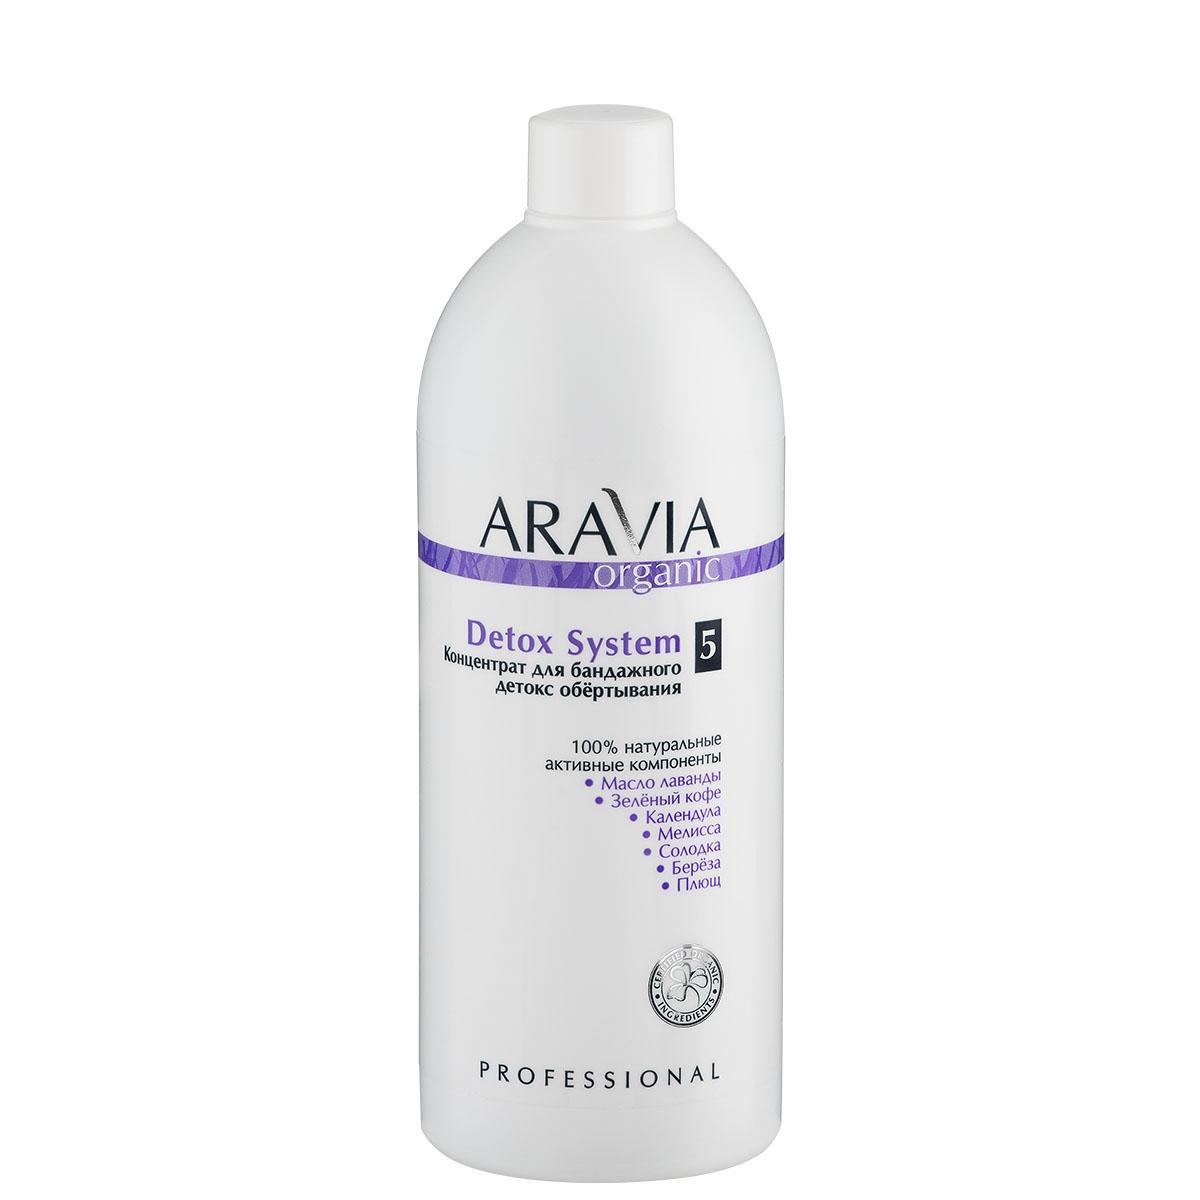 ARAVIA Концентрат Detox System для бандажного детокс обертывания, 500 мл